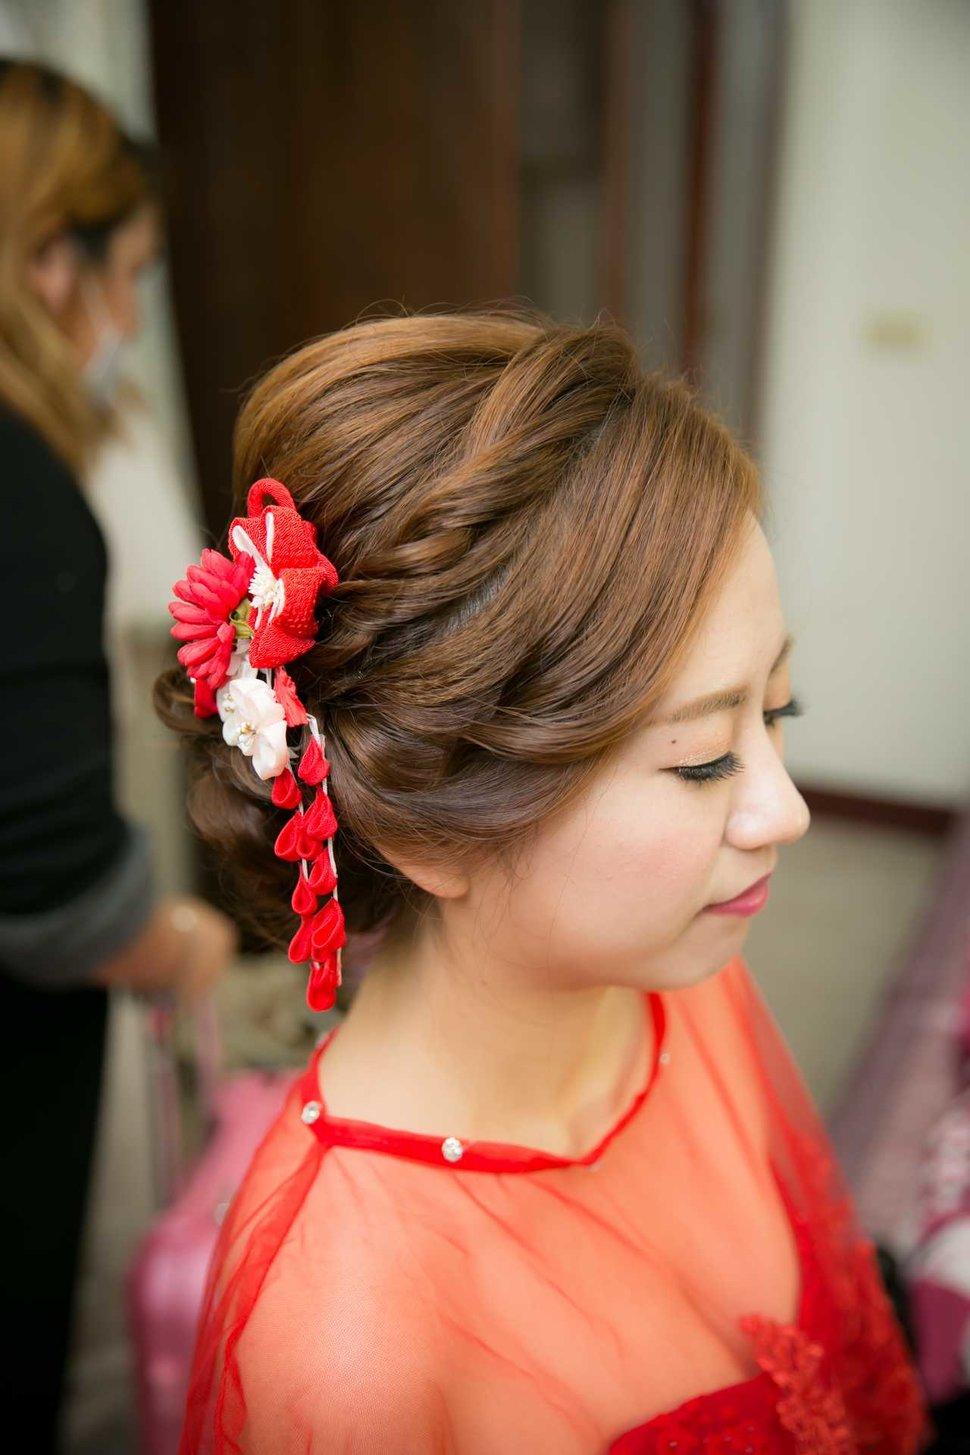 Wedding_Photo_2016_007 - 新竹婚禮攝影師Donger-婚攝東哥《結婚吧》